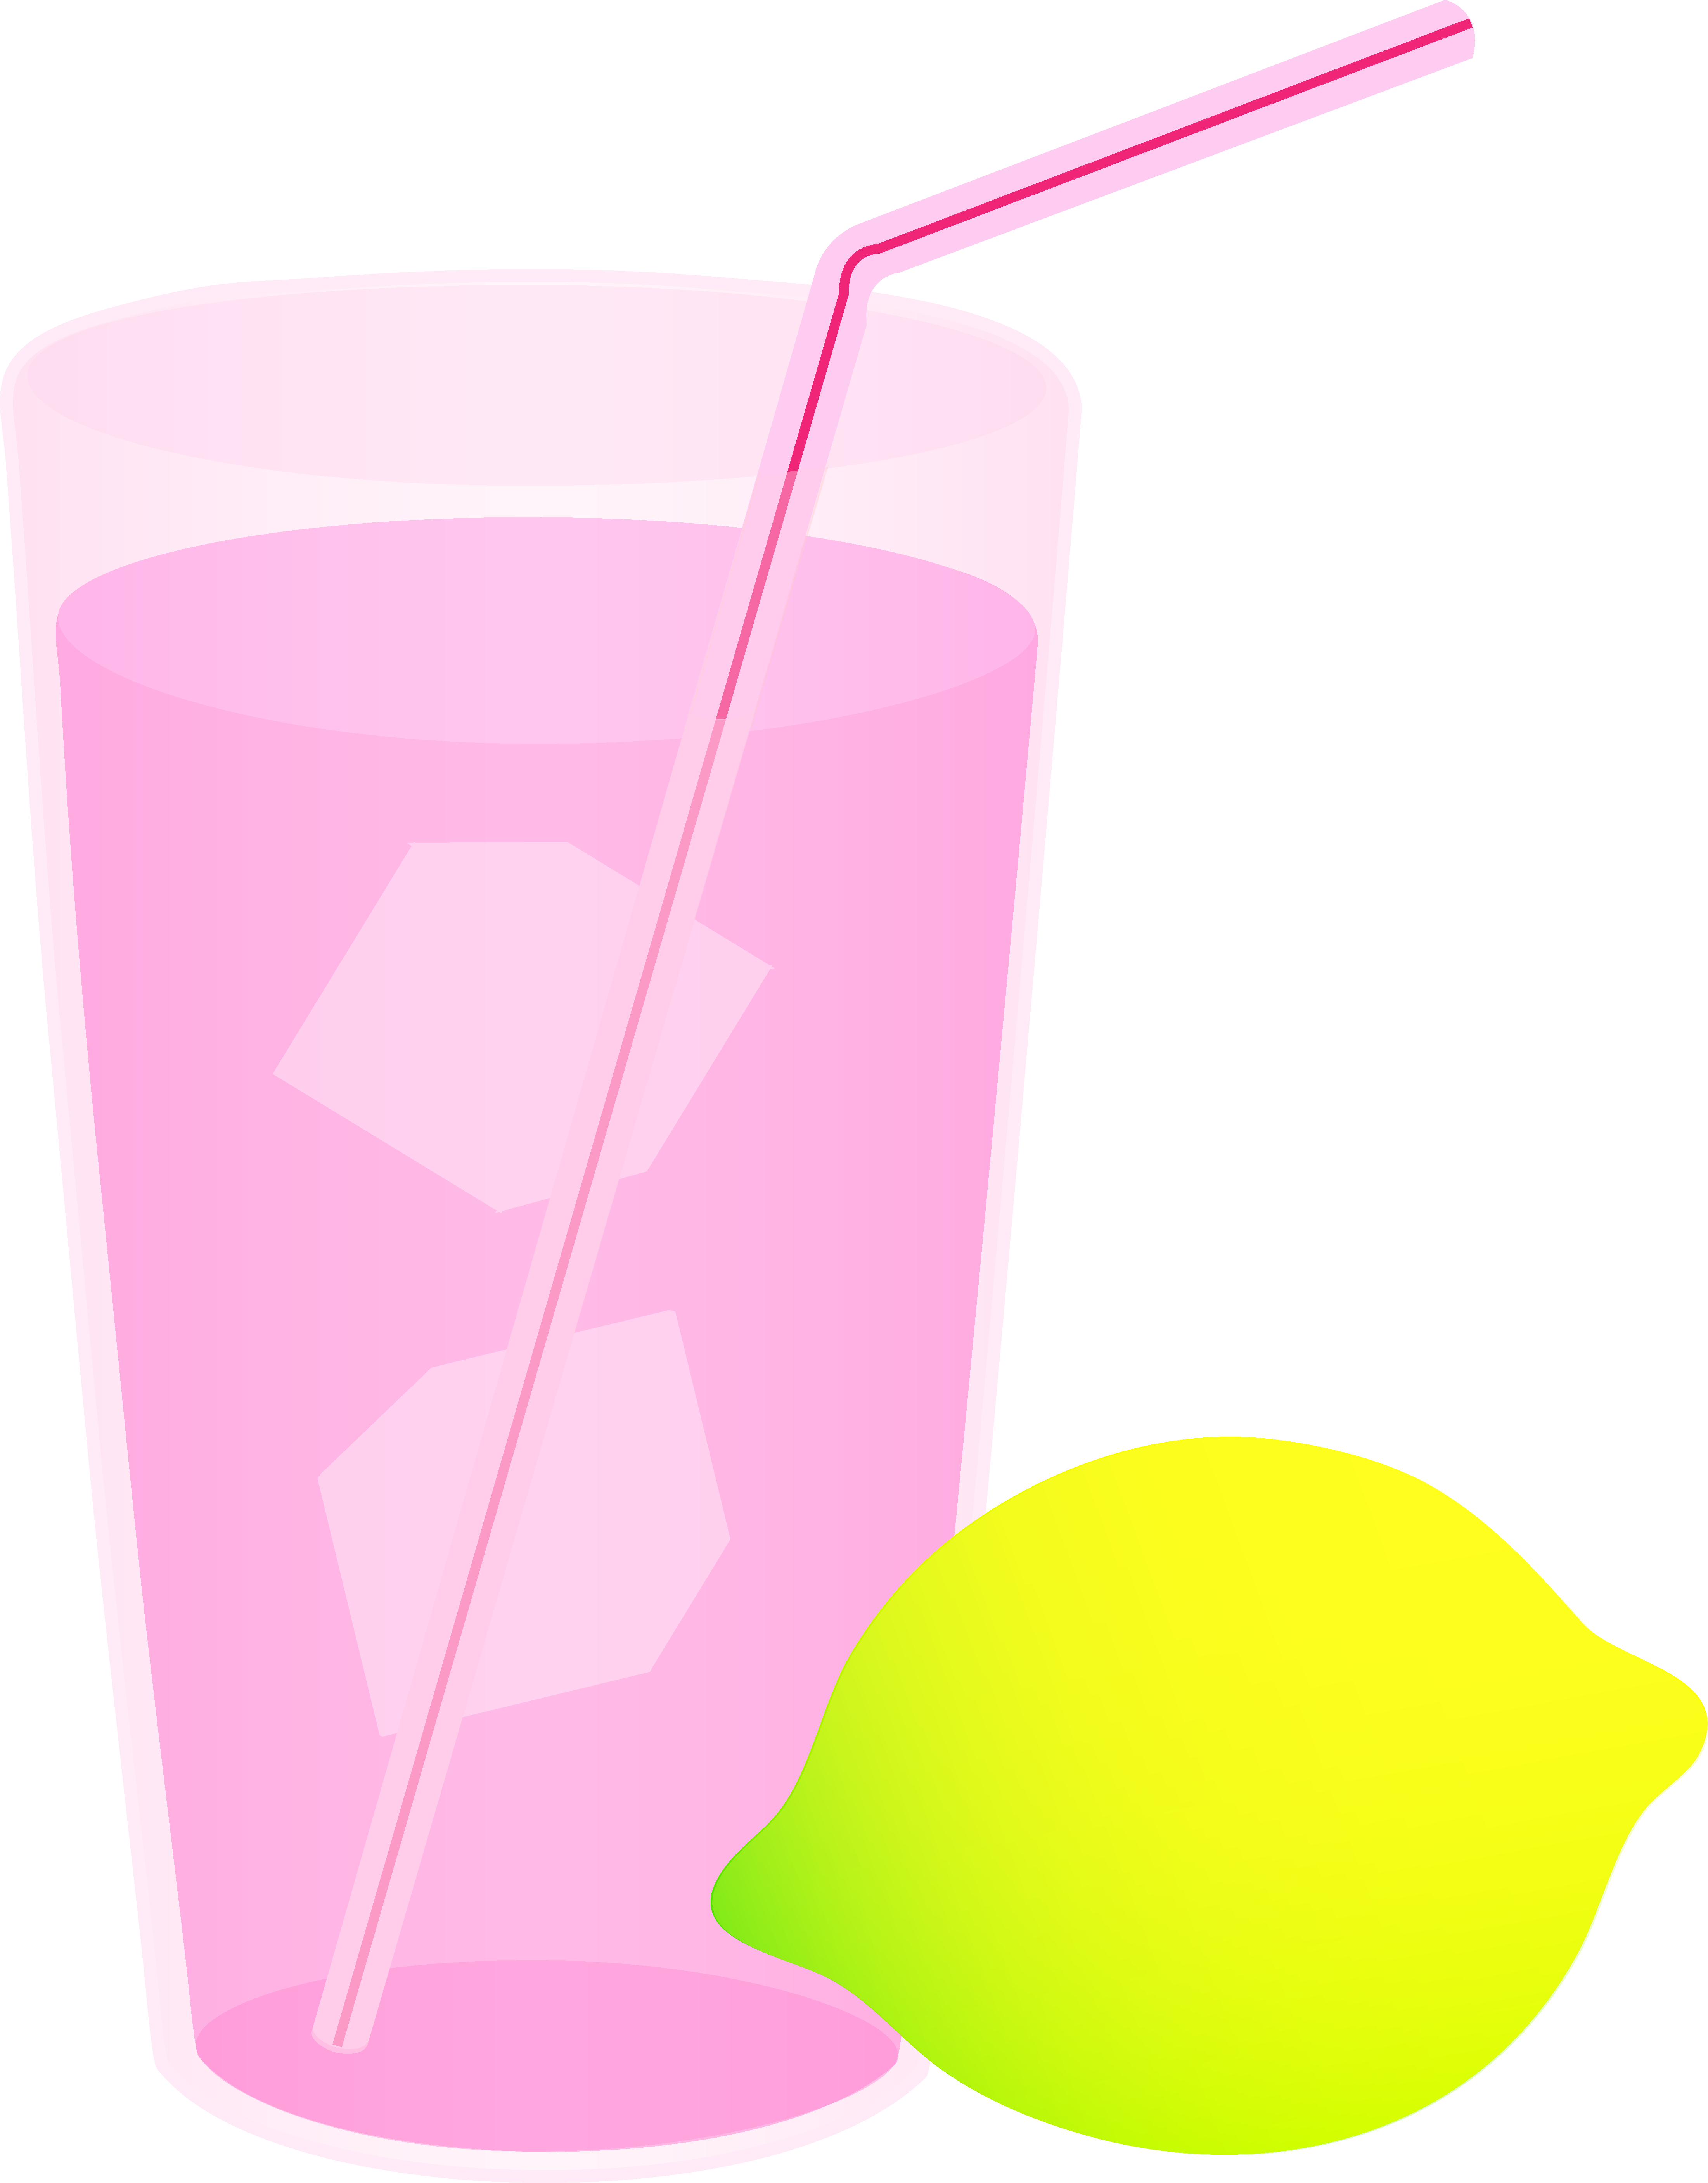 Drink clipart pink lemonade Lemonade Lemonade Pink Clip Glass